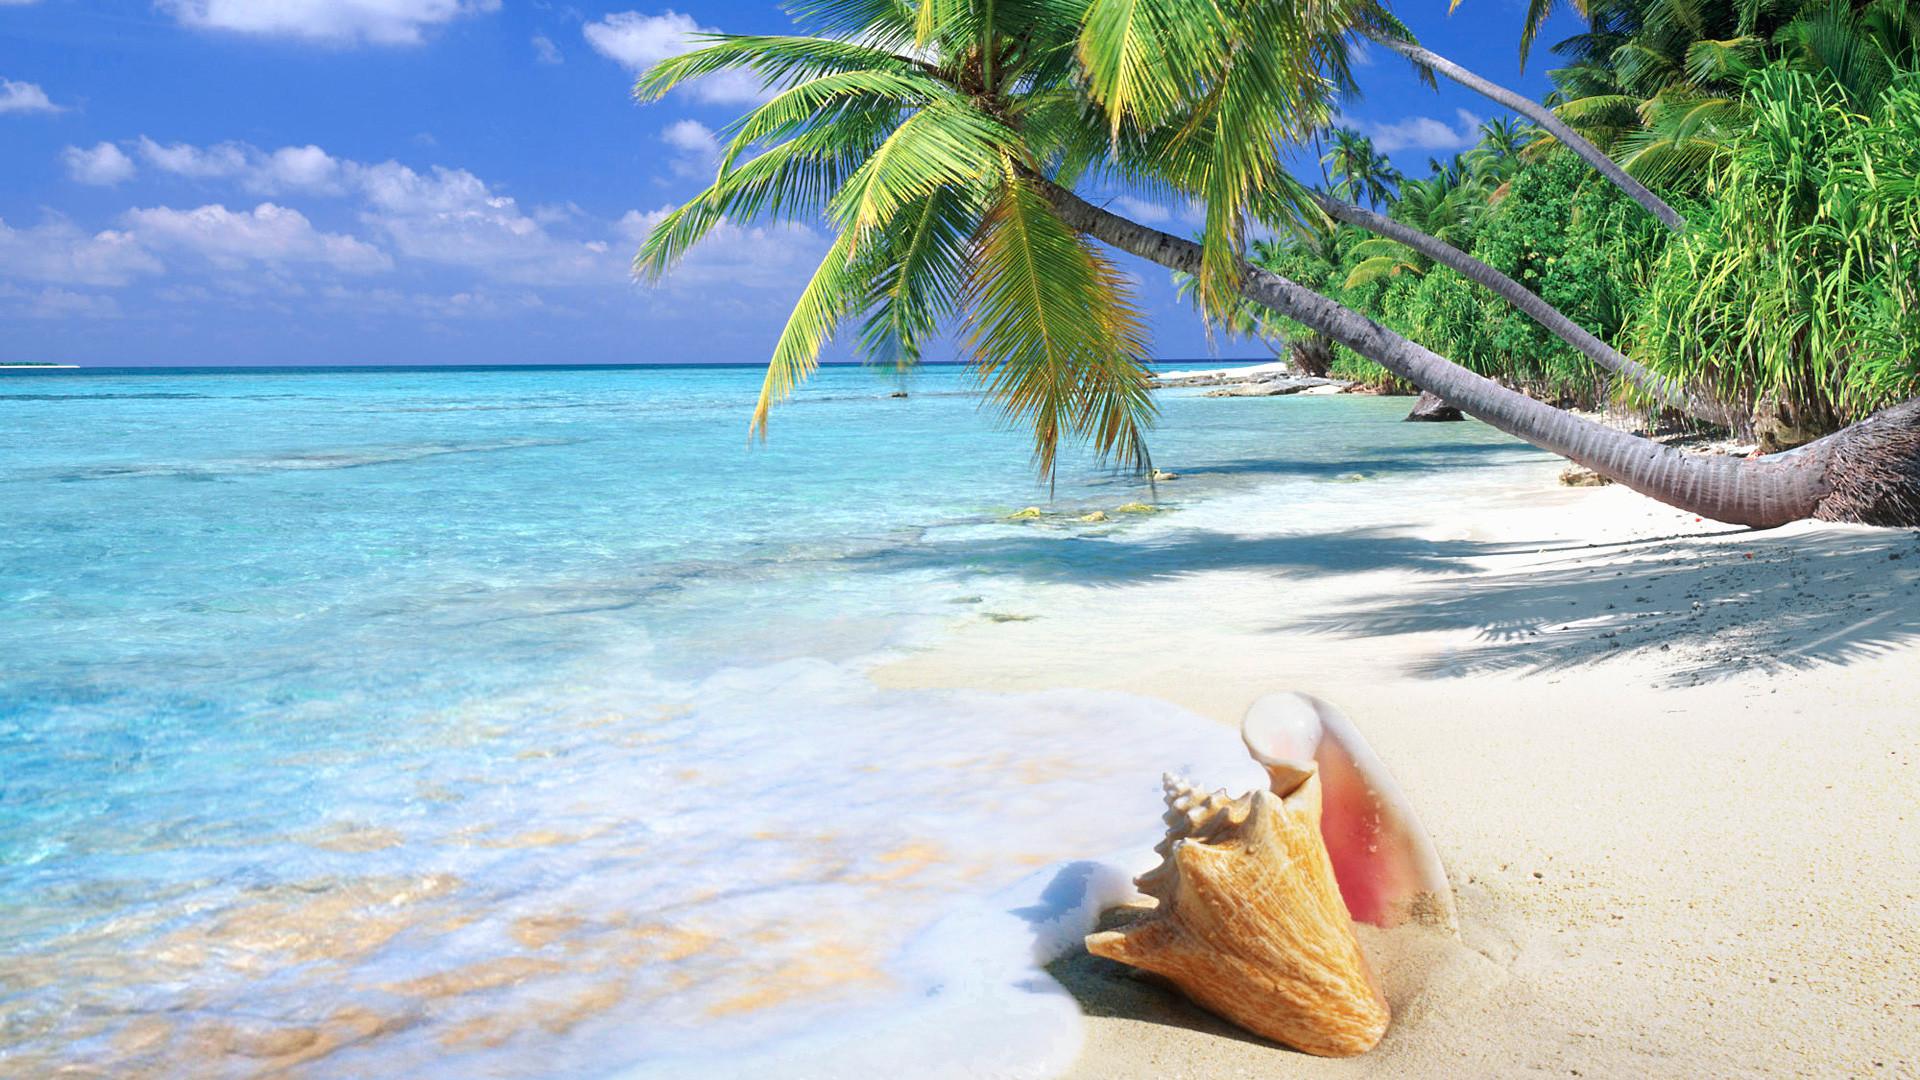 1920x1080 Beach 4K Ultra HD Wallpaper Download Aleshia Foley